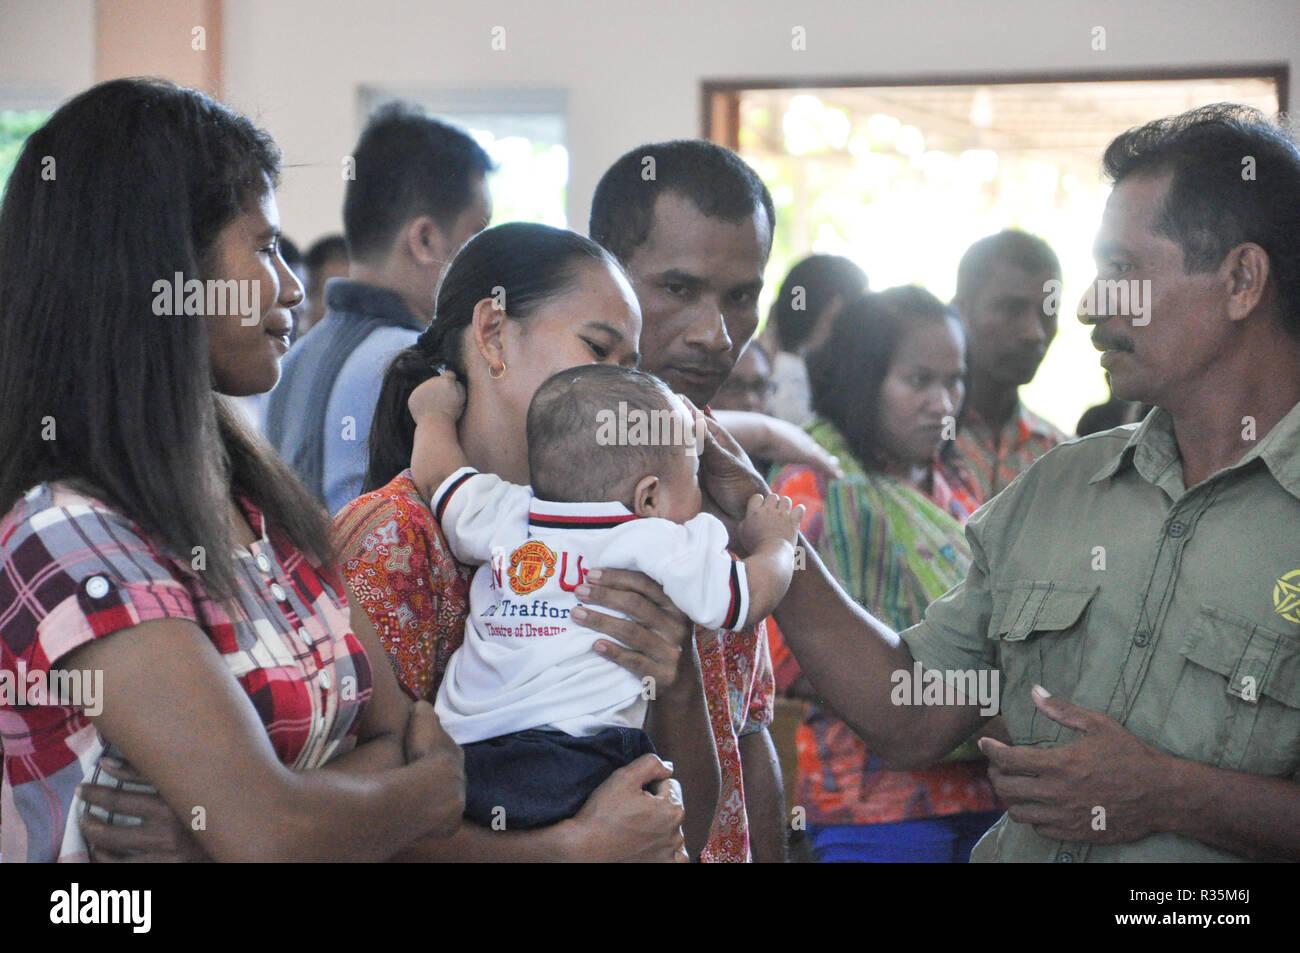 Batam, Indonesia. Families celebrate children baptism. - Stock Image